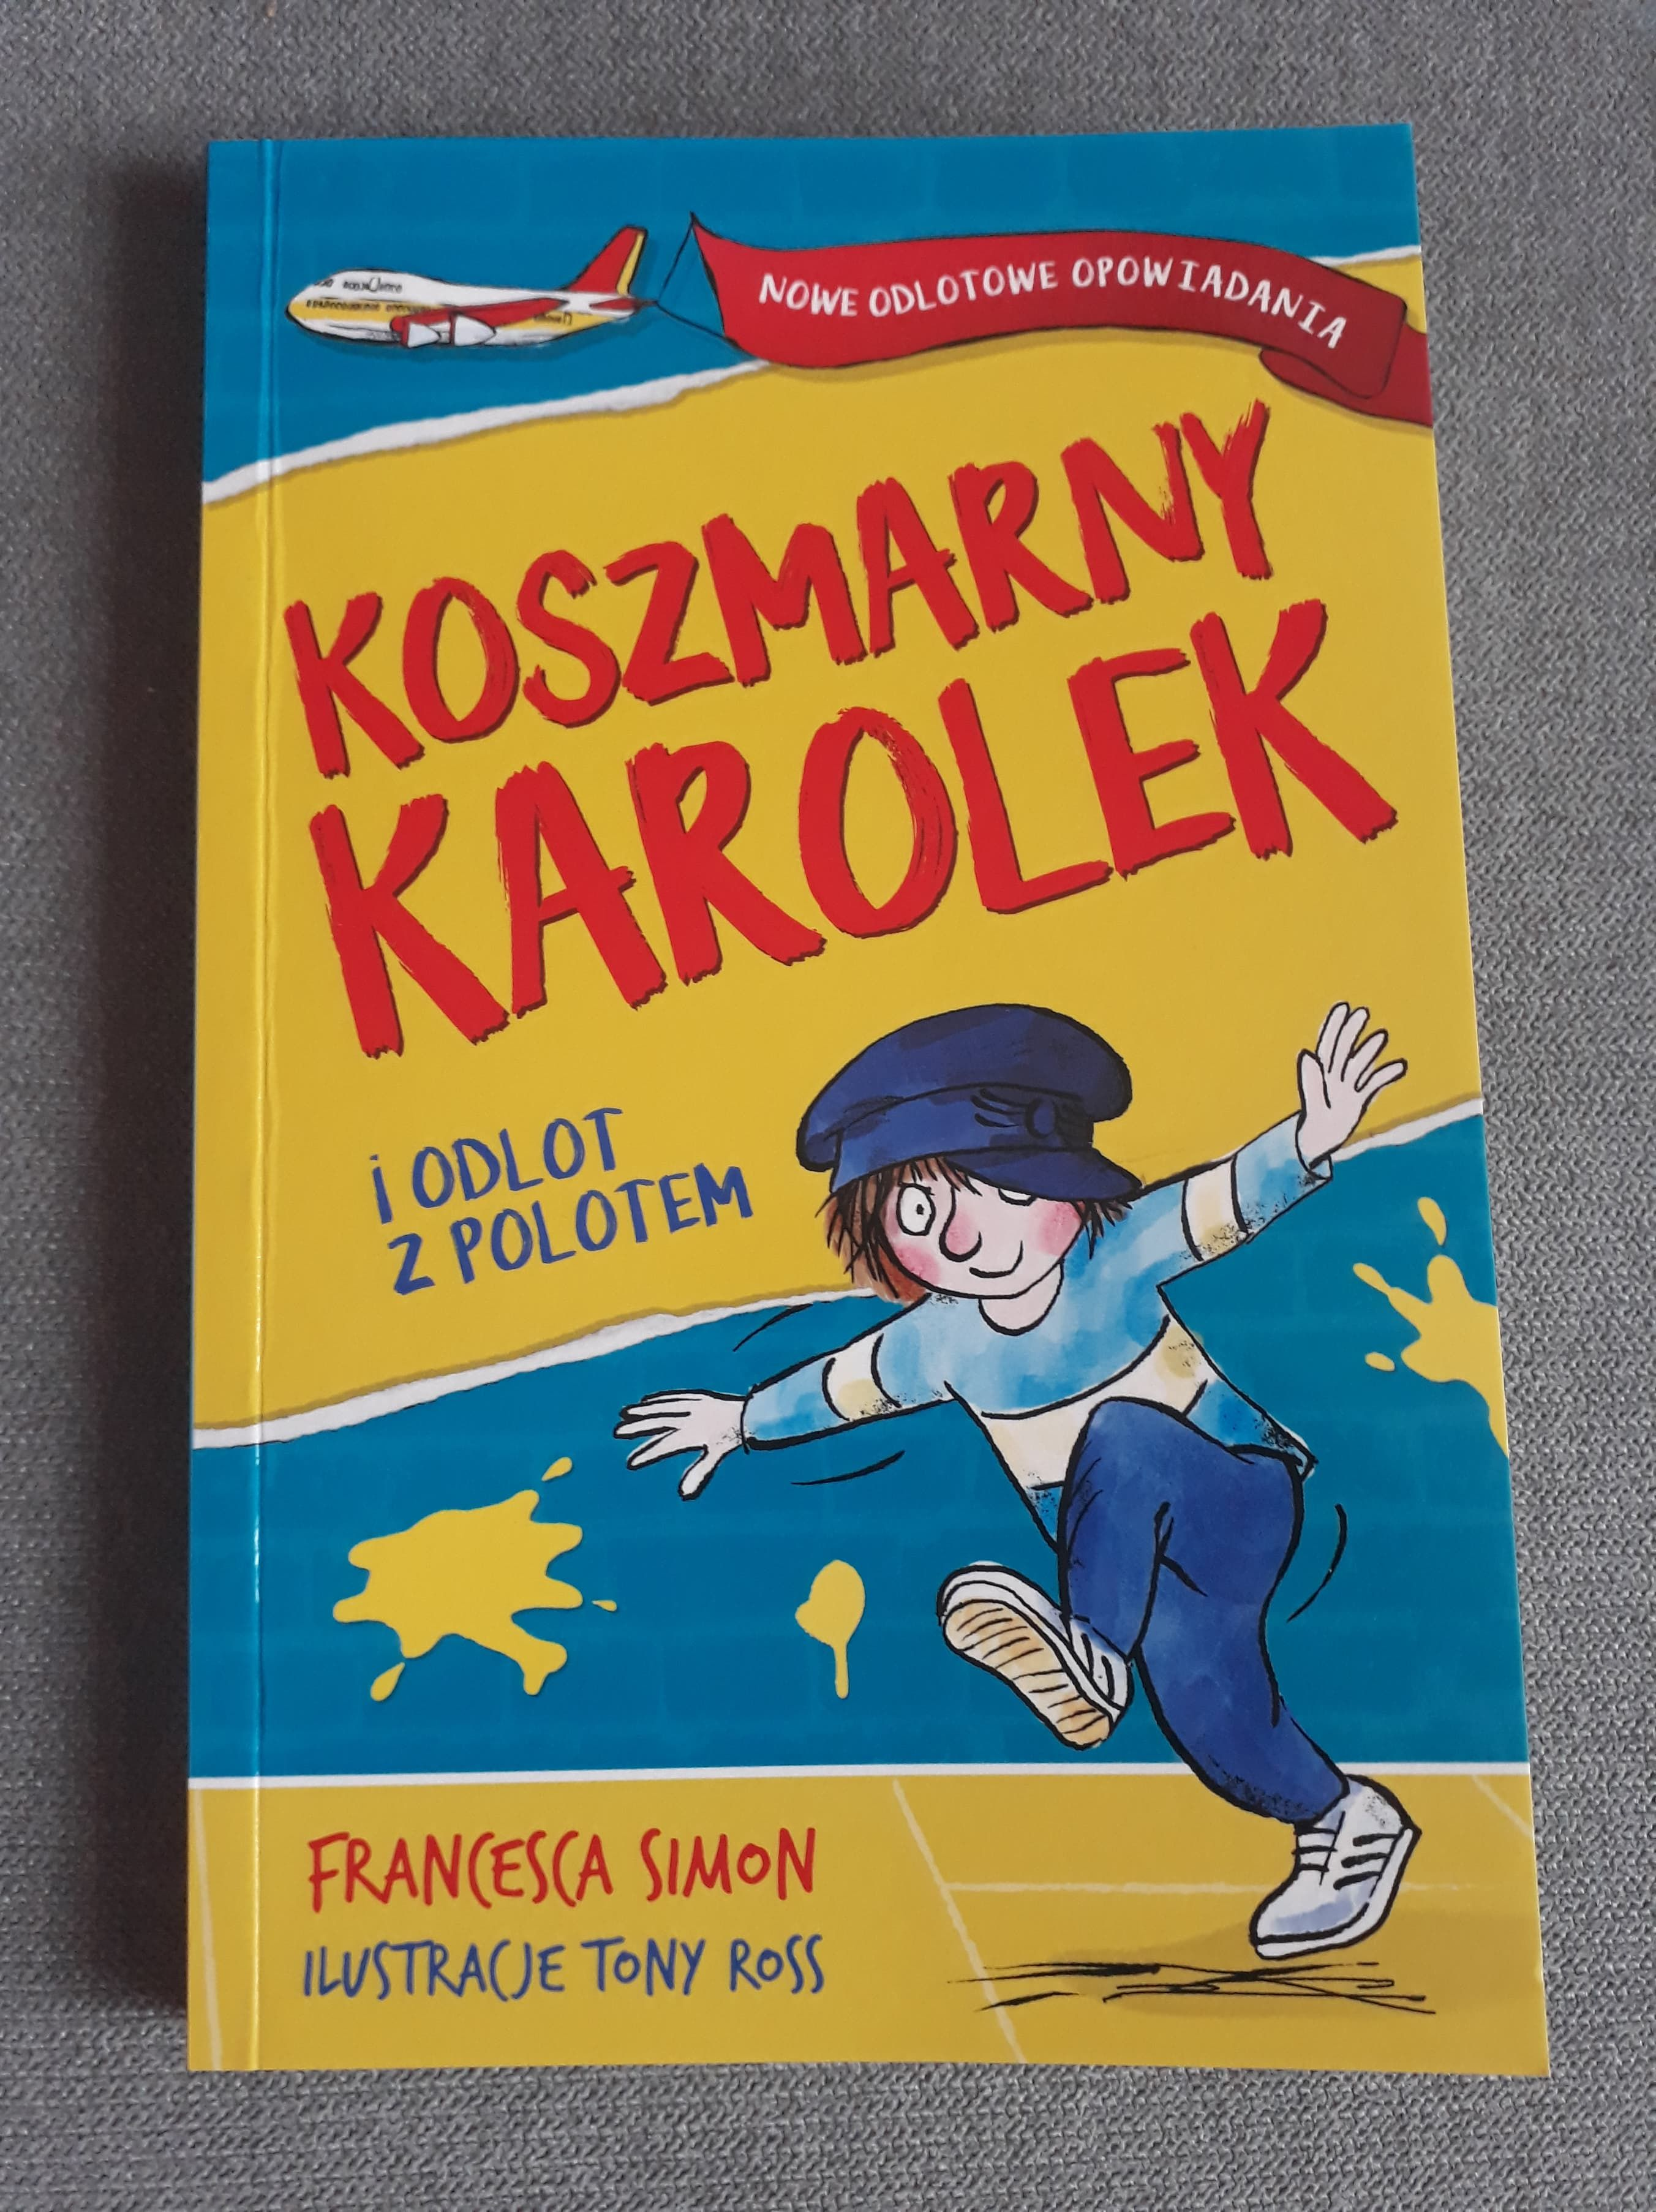 karolek-3